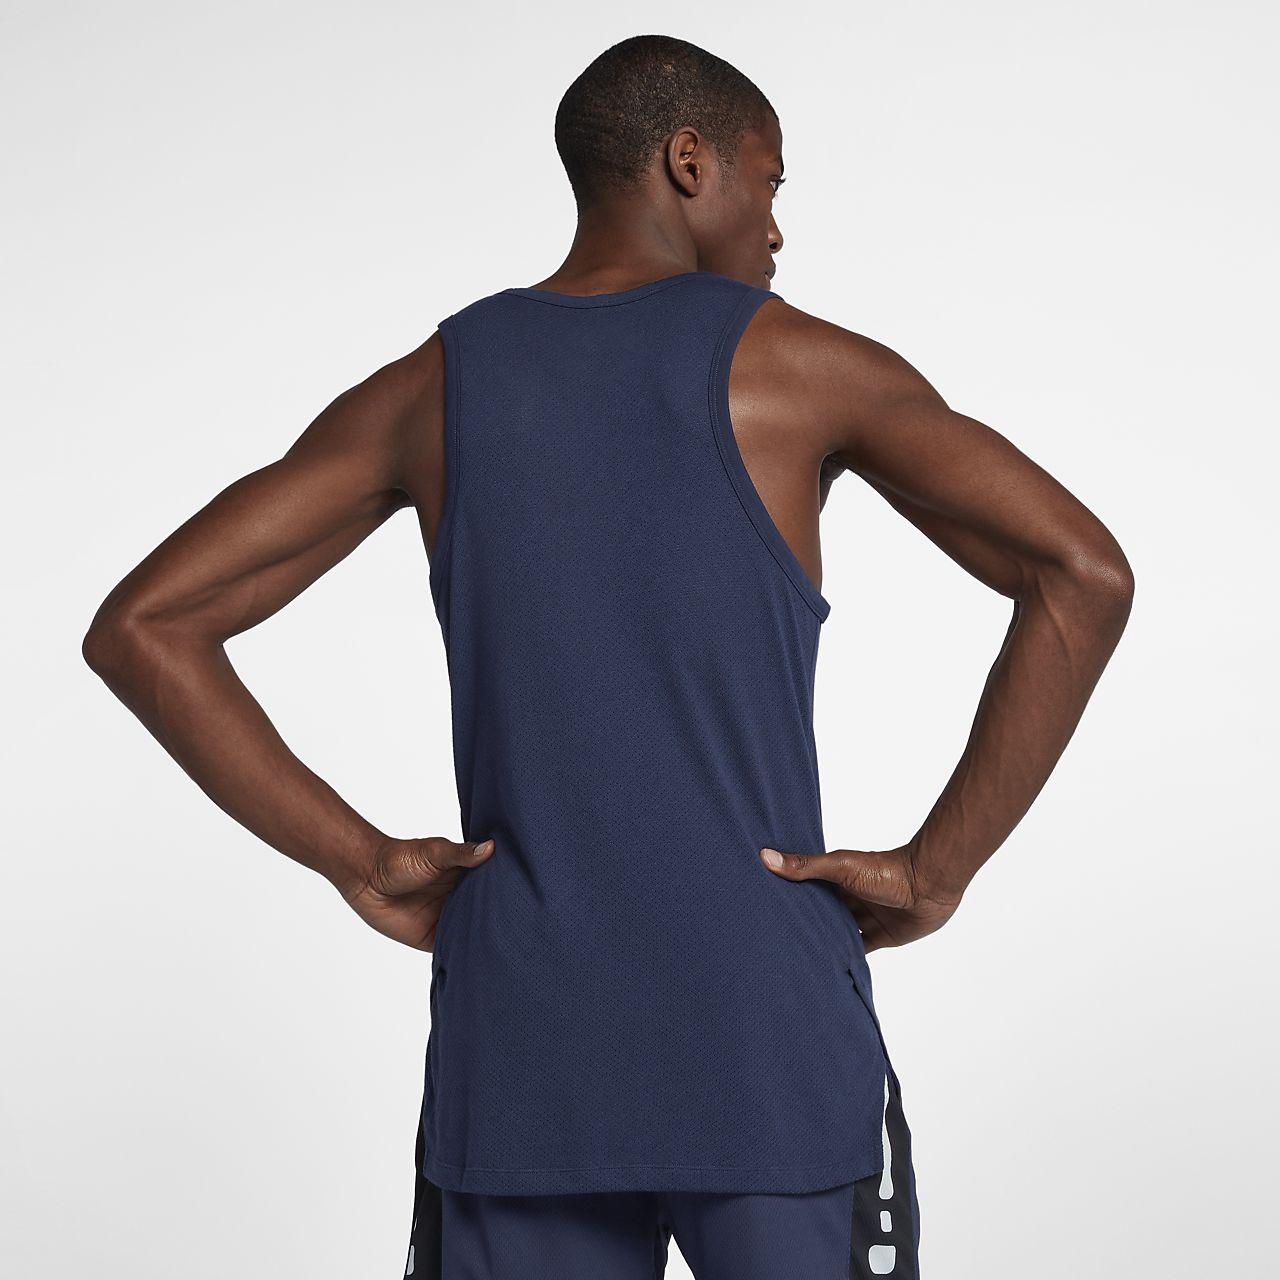 e390be69b76b Nike Breathe Elite Men s Sleeveless Basketball Top. Nike.com SK